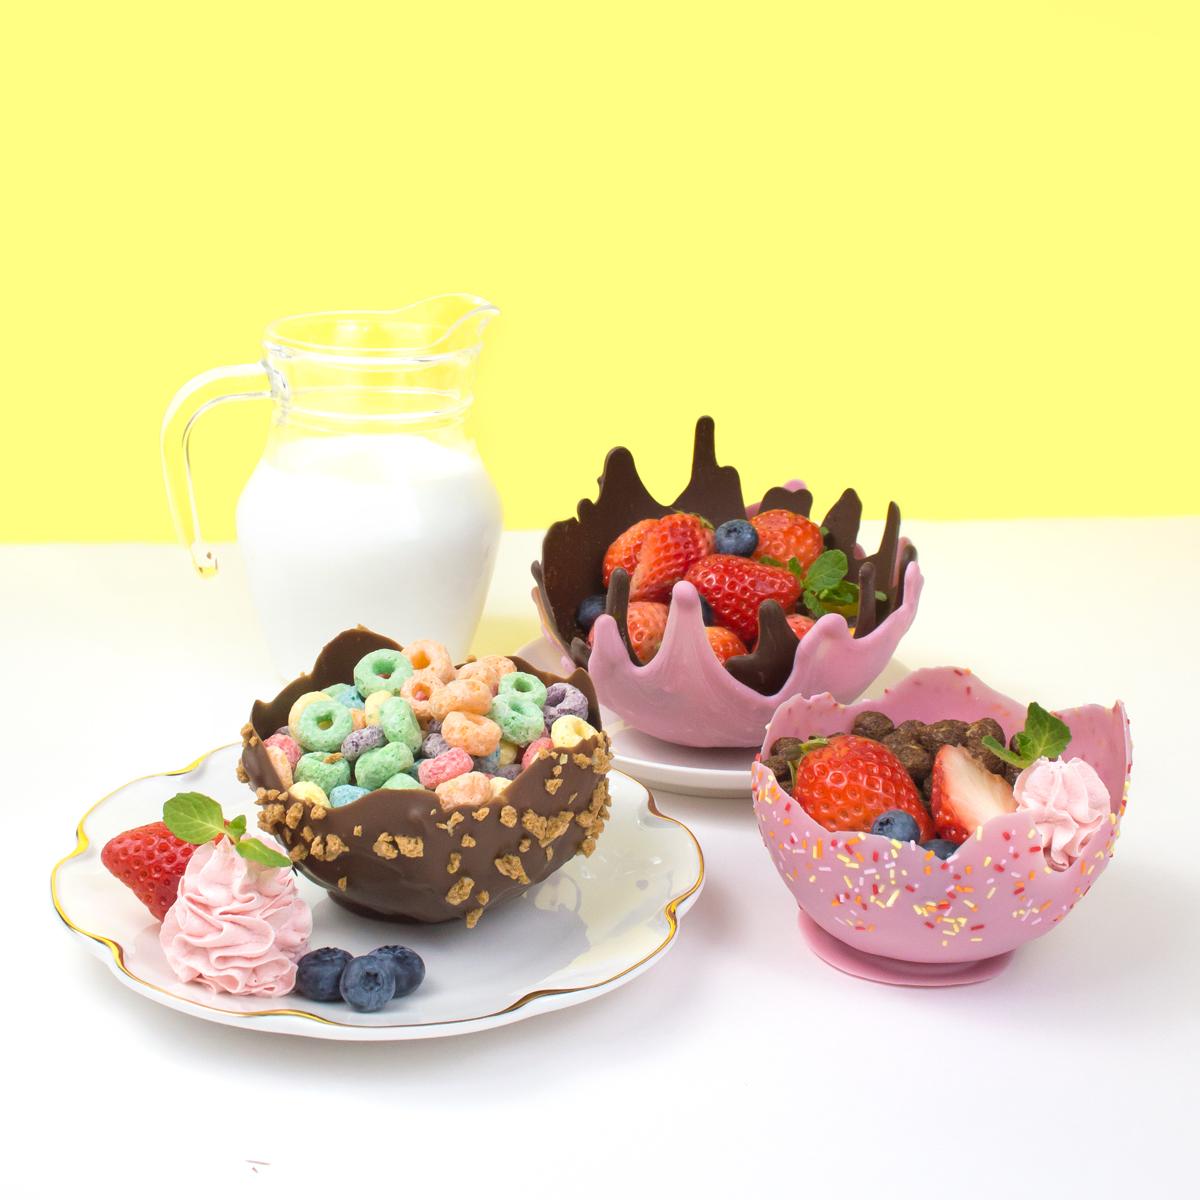 <center>食べれるお皿!風船で作る簡単チョコレートボウルの作り方 <br><small>Edible Chocolate Bowl</small></center>